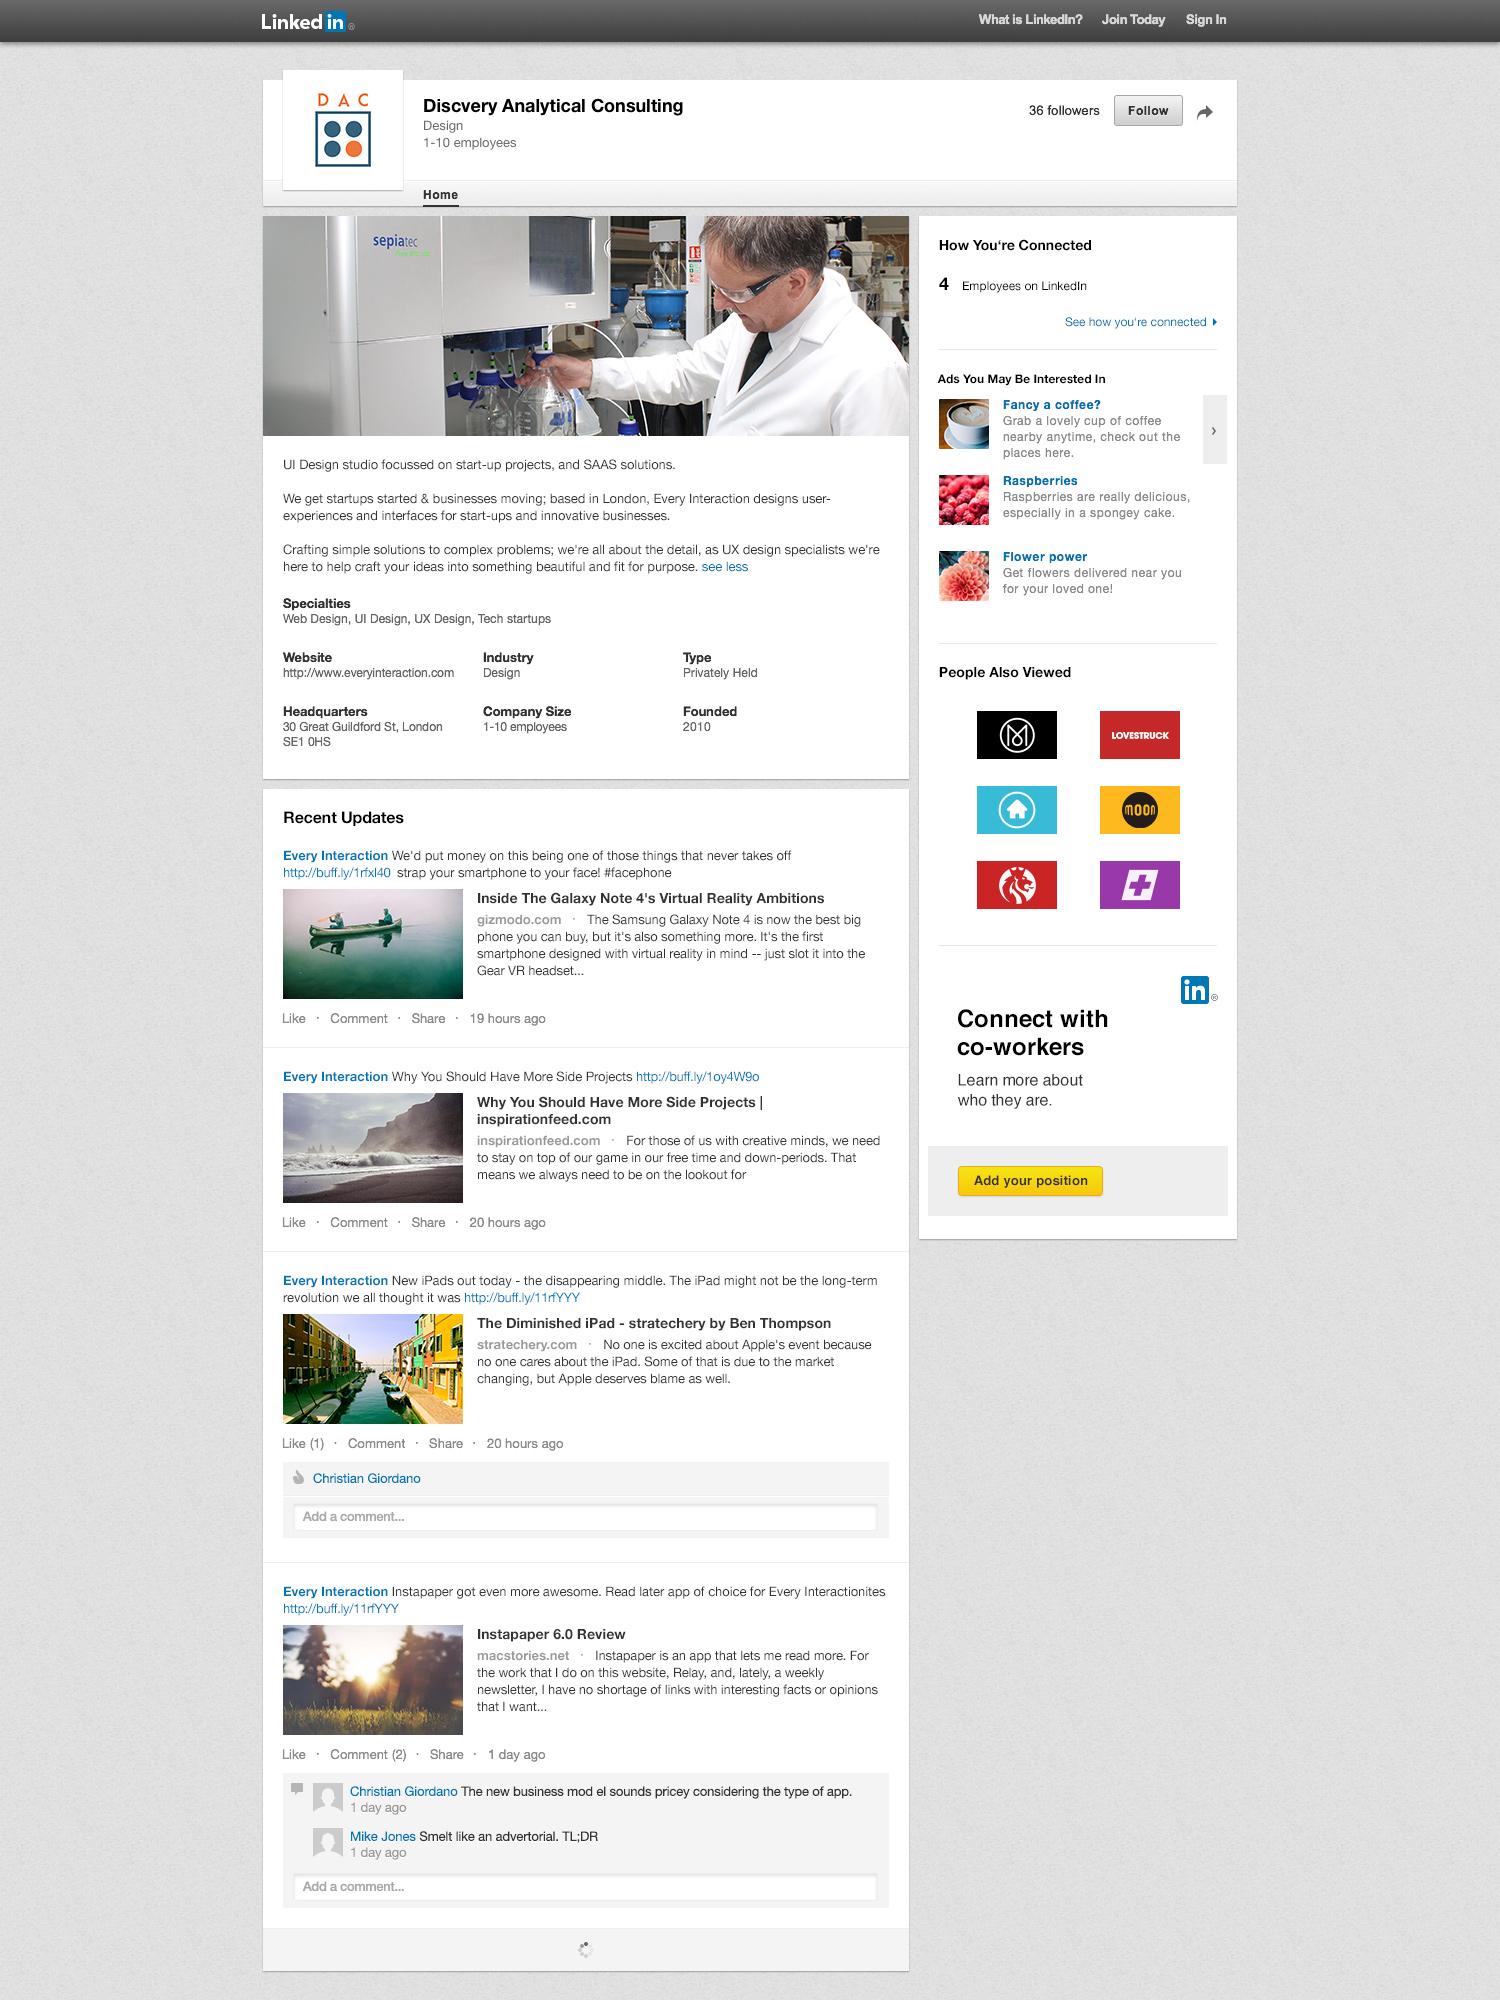 Krishna Solanki Designs  - Discovery Analytical Consulting Ltd - LinkedIn graphics